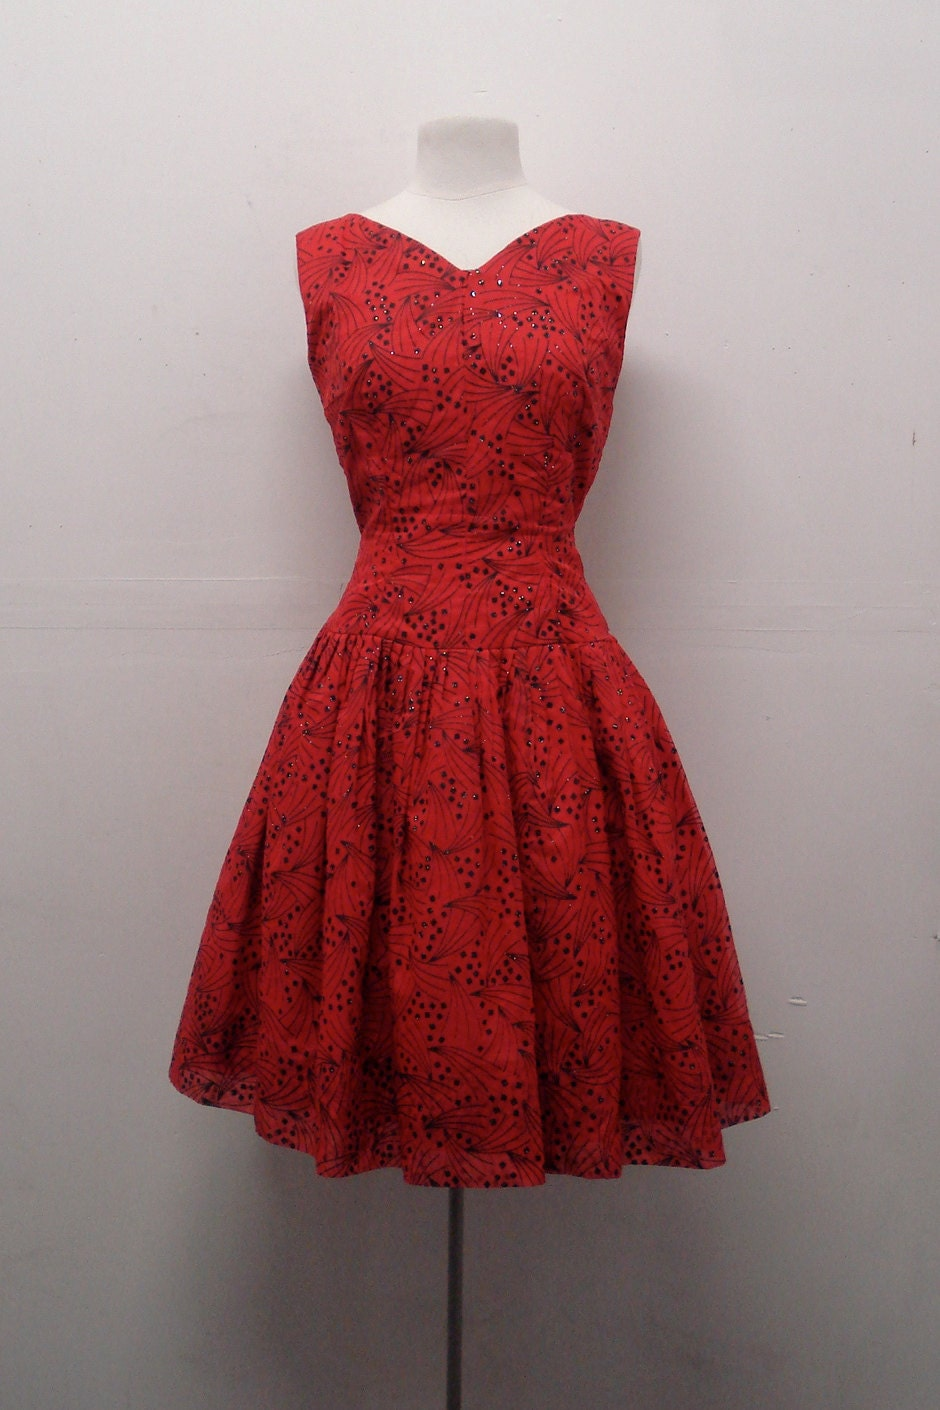 Retro cocktail dresses